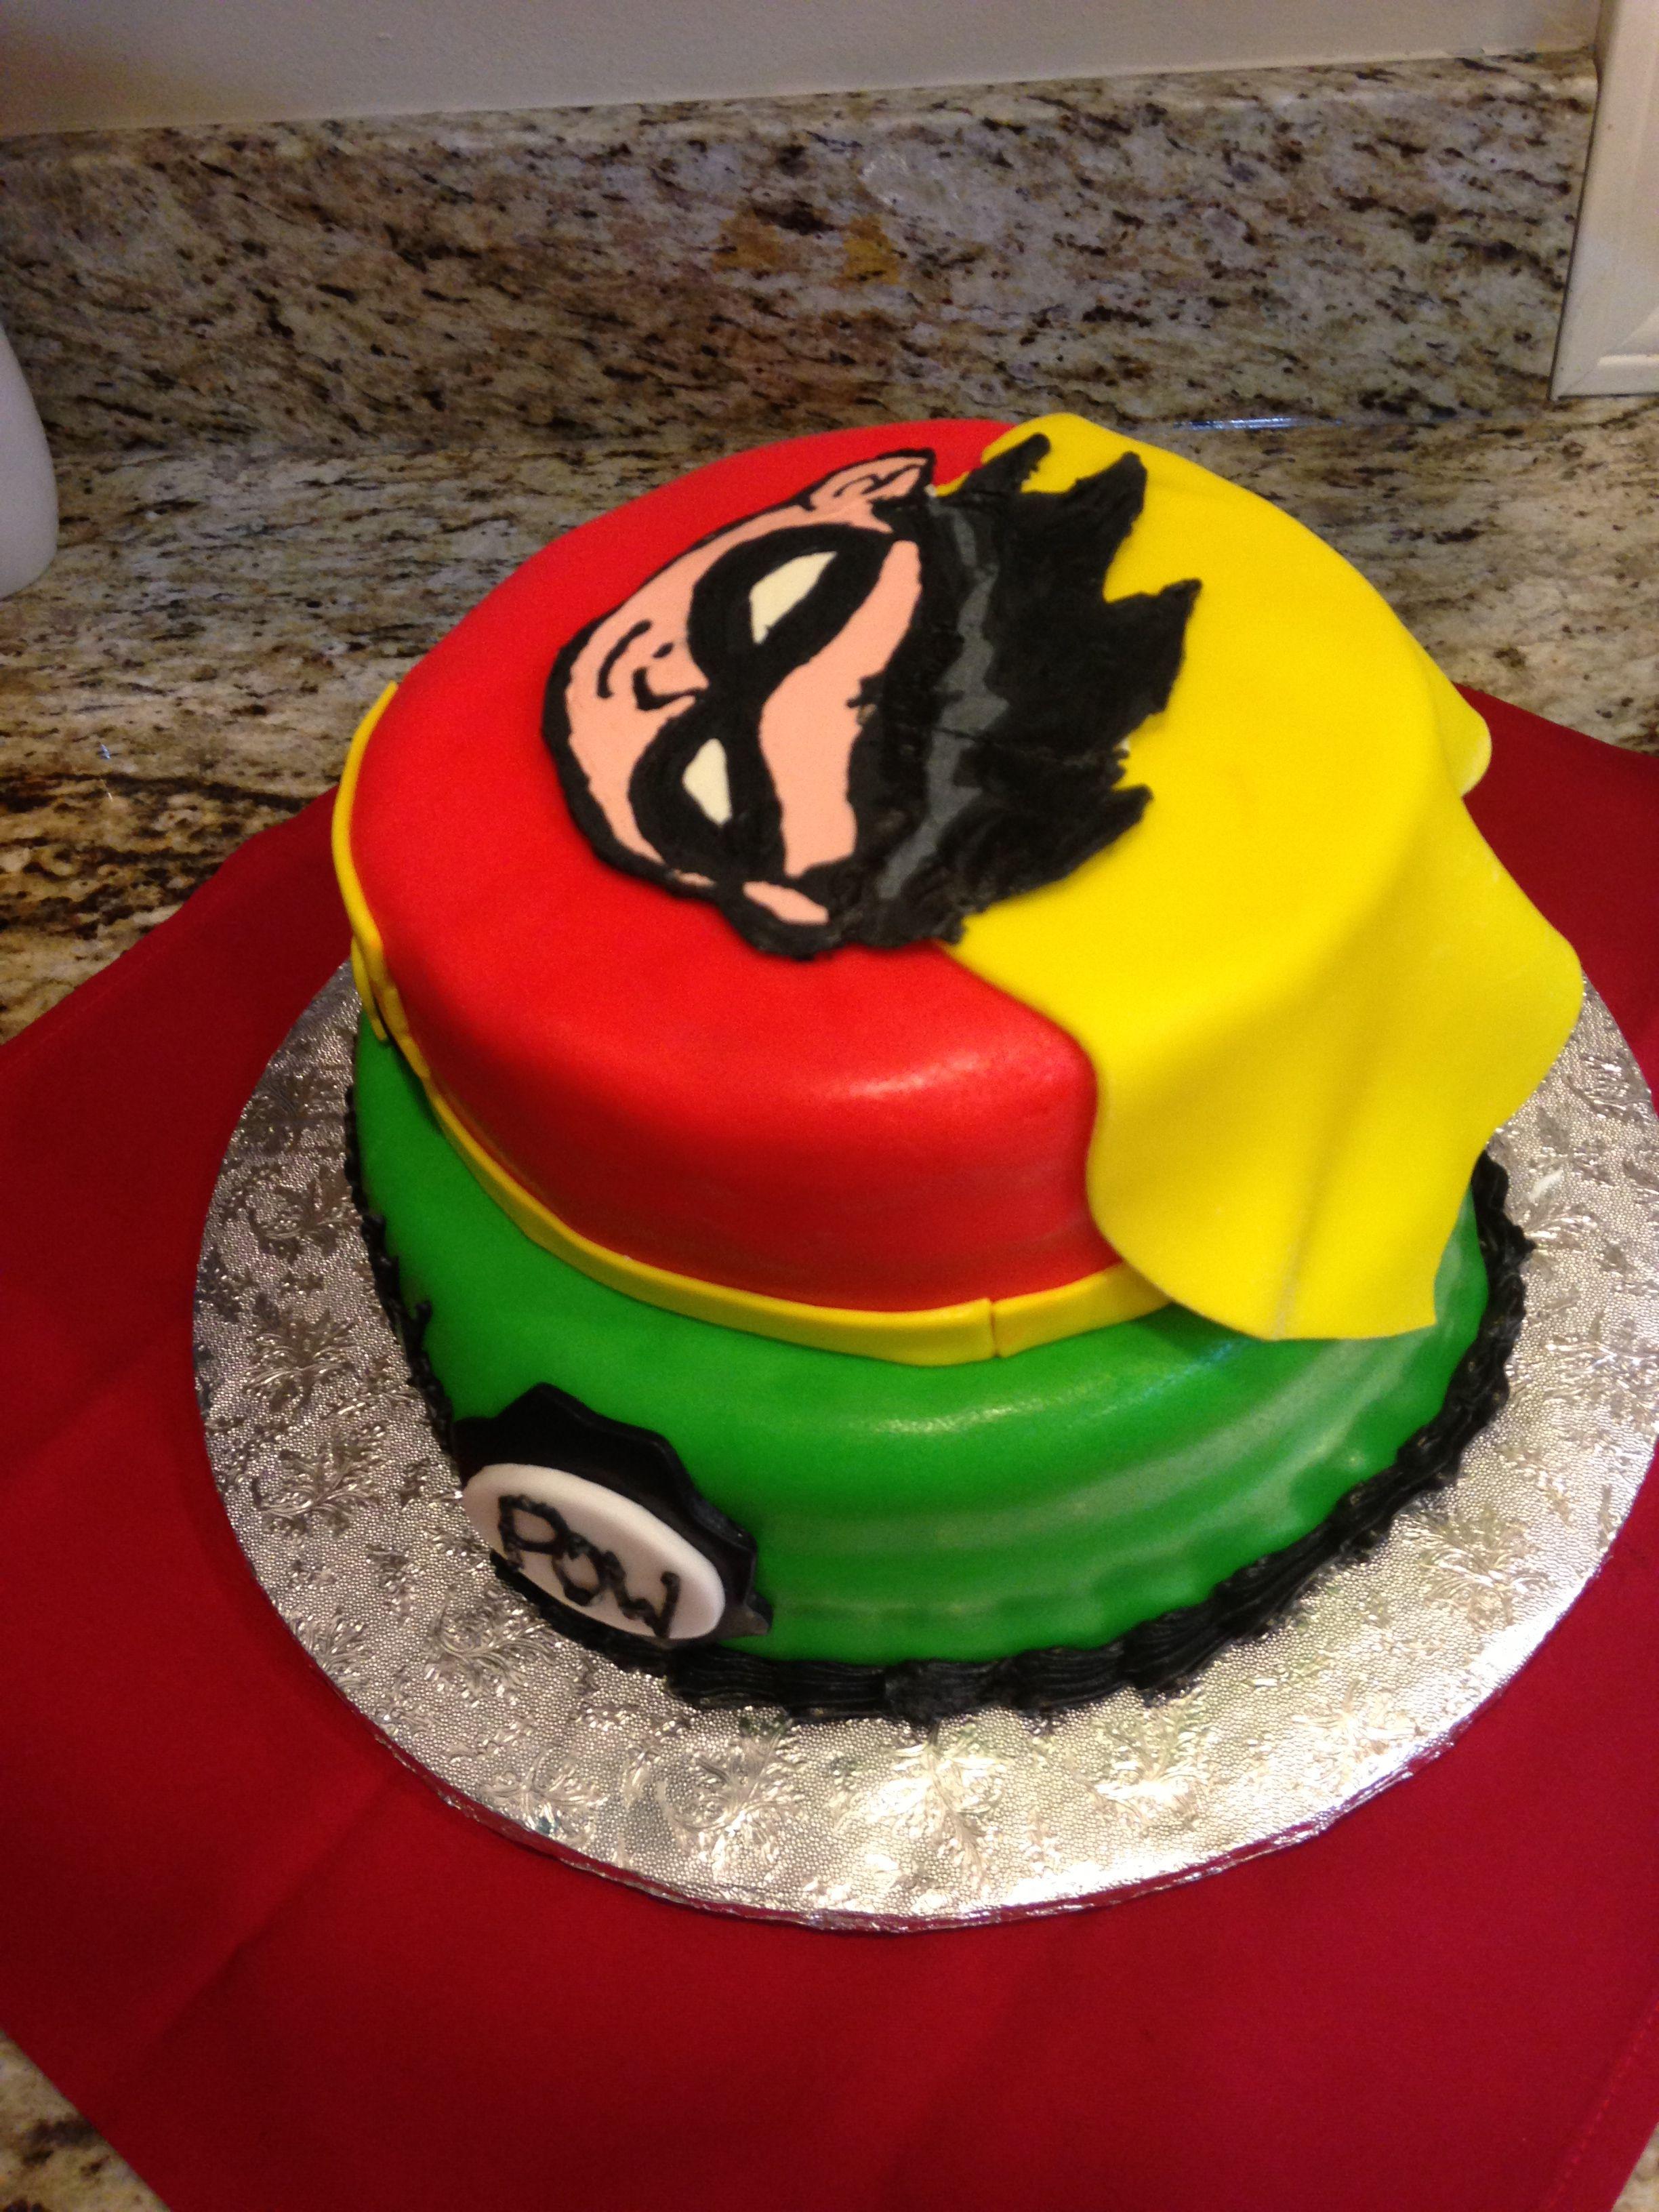 Teen titans, fun boy cake | My work! Cakes/Cupcakes ...  Teen titans, fu...